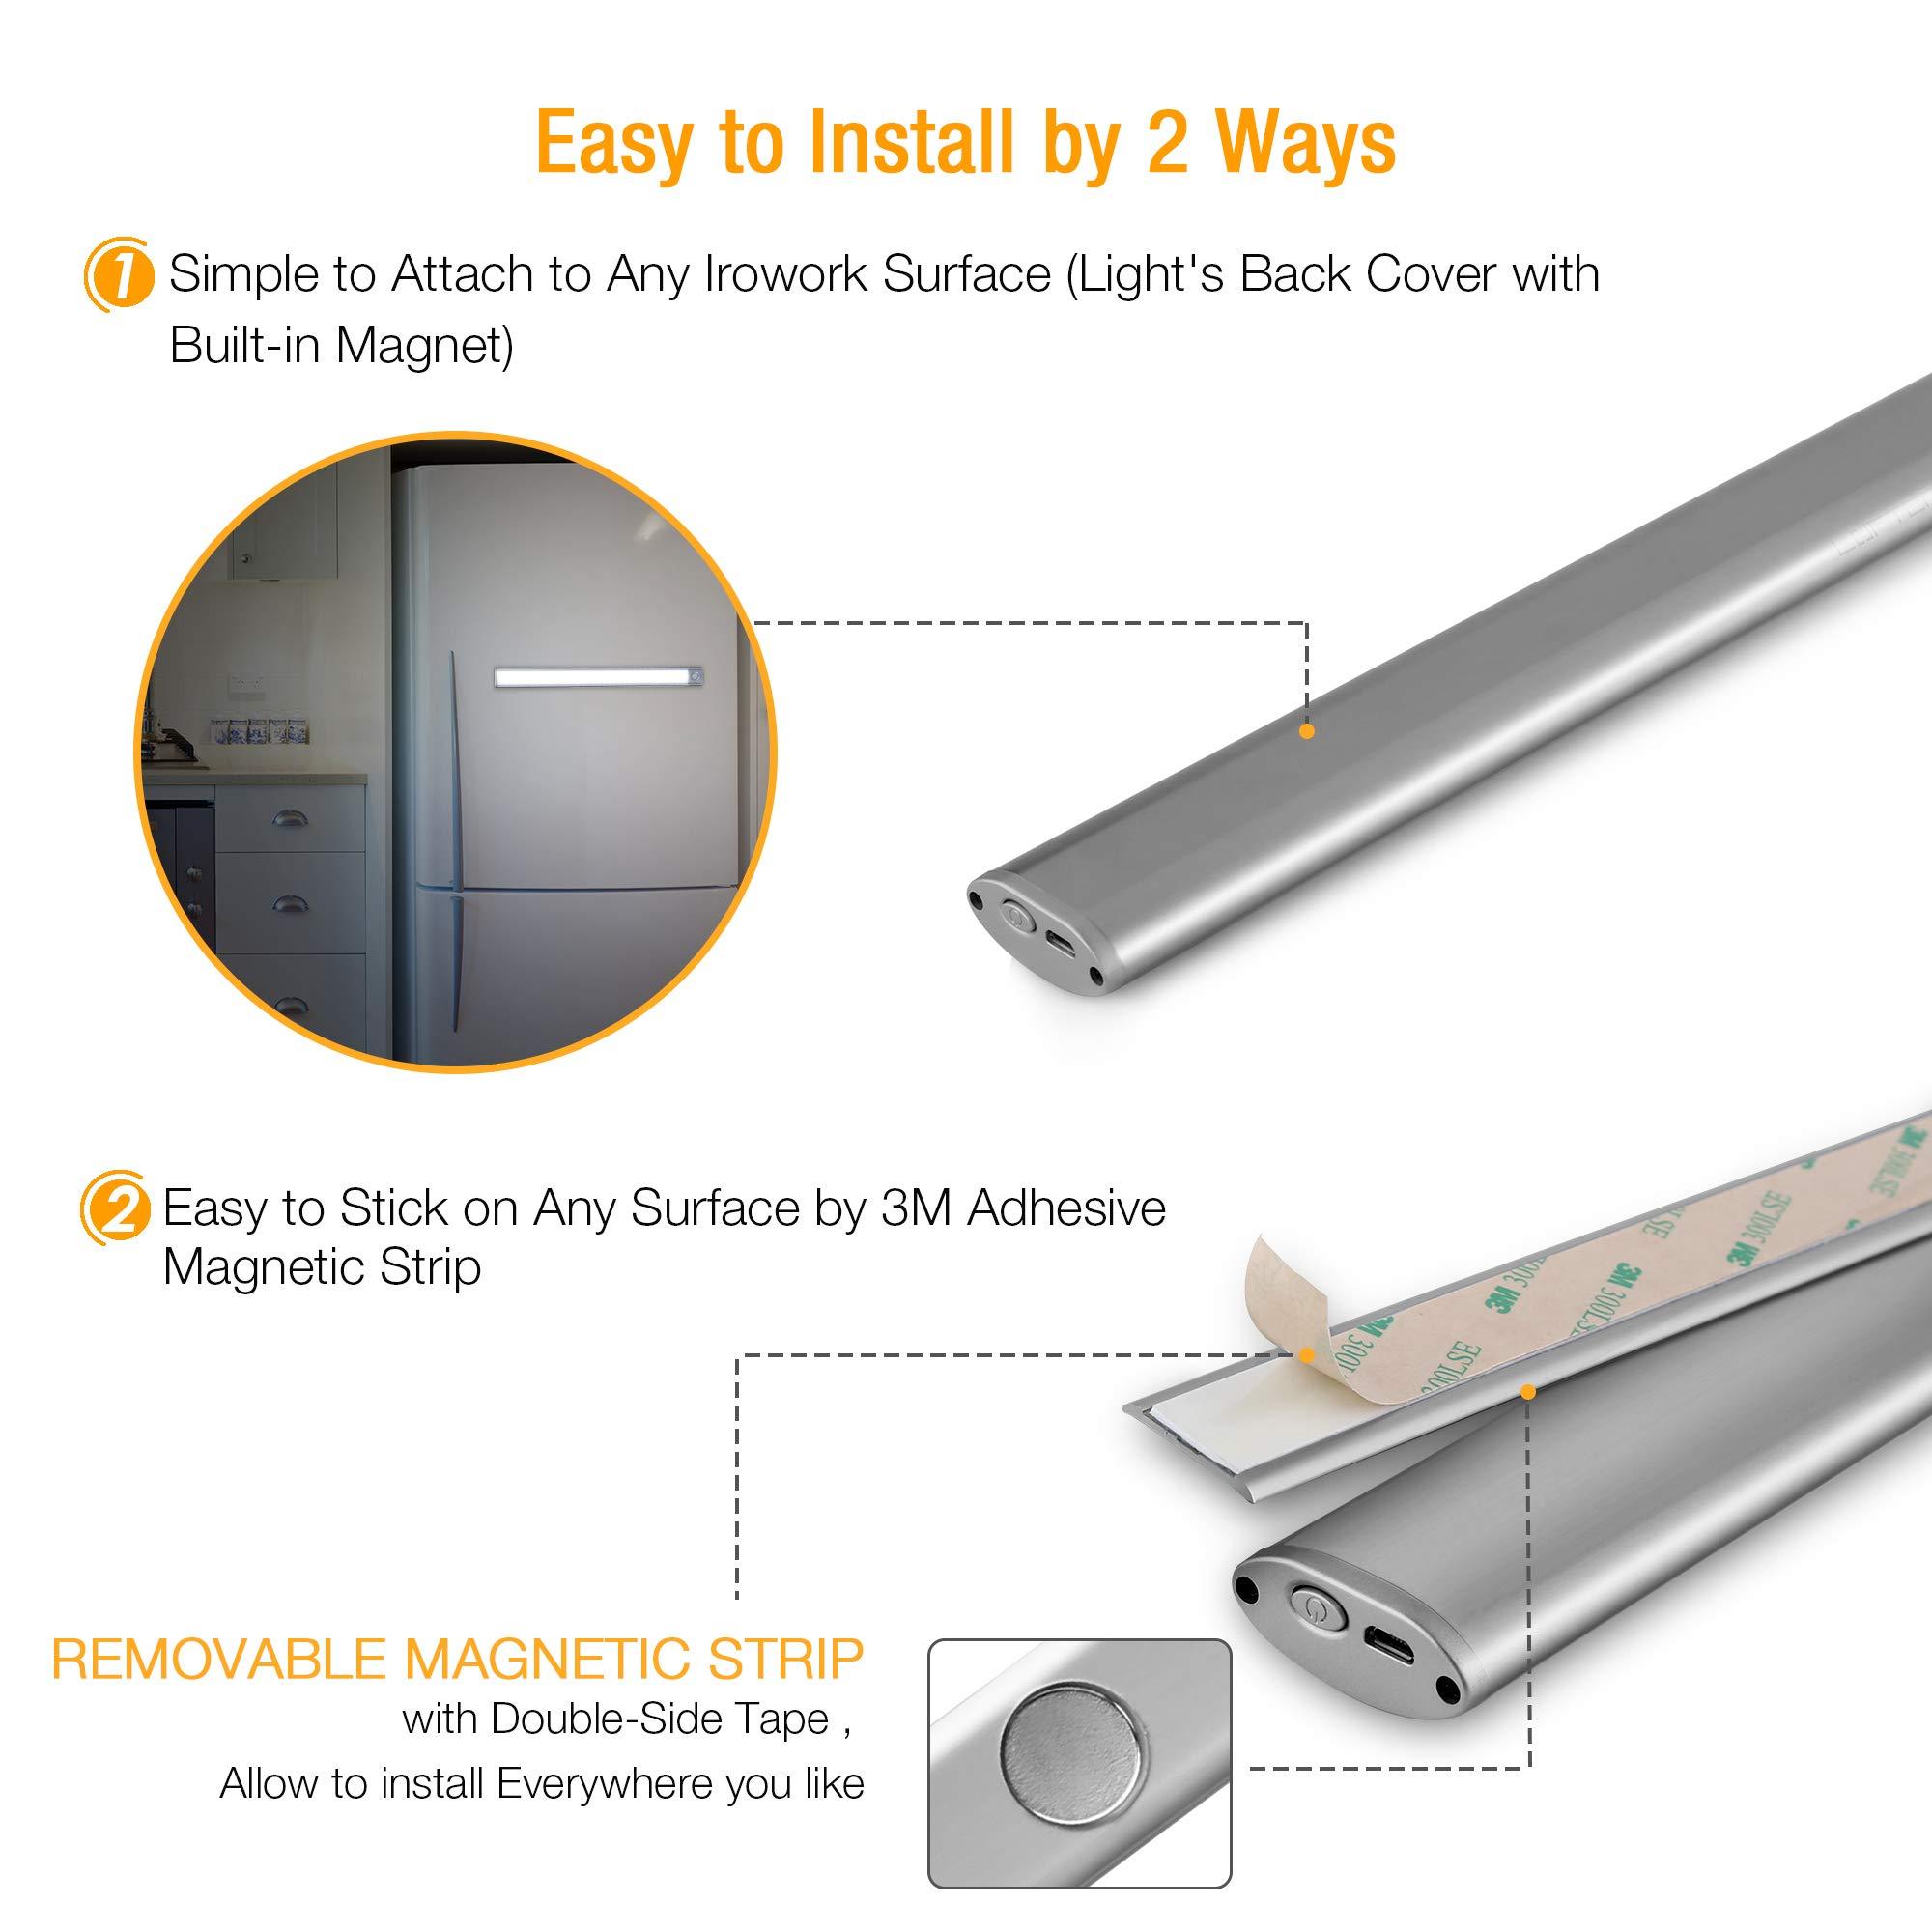 66 LED Under Cabinet Light, Rechargeable Motion Sensor Closet Light Wireless Luxury Aluminum Night Lighting for Kitchen Cabinet, Closet, Wardrobe, 2 Sensor Mode (Only Motion, Motion & Light) by LOFTER (Image #6)